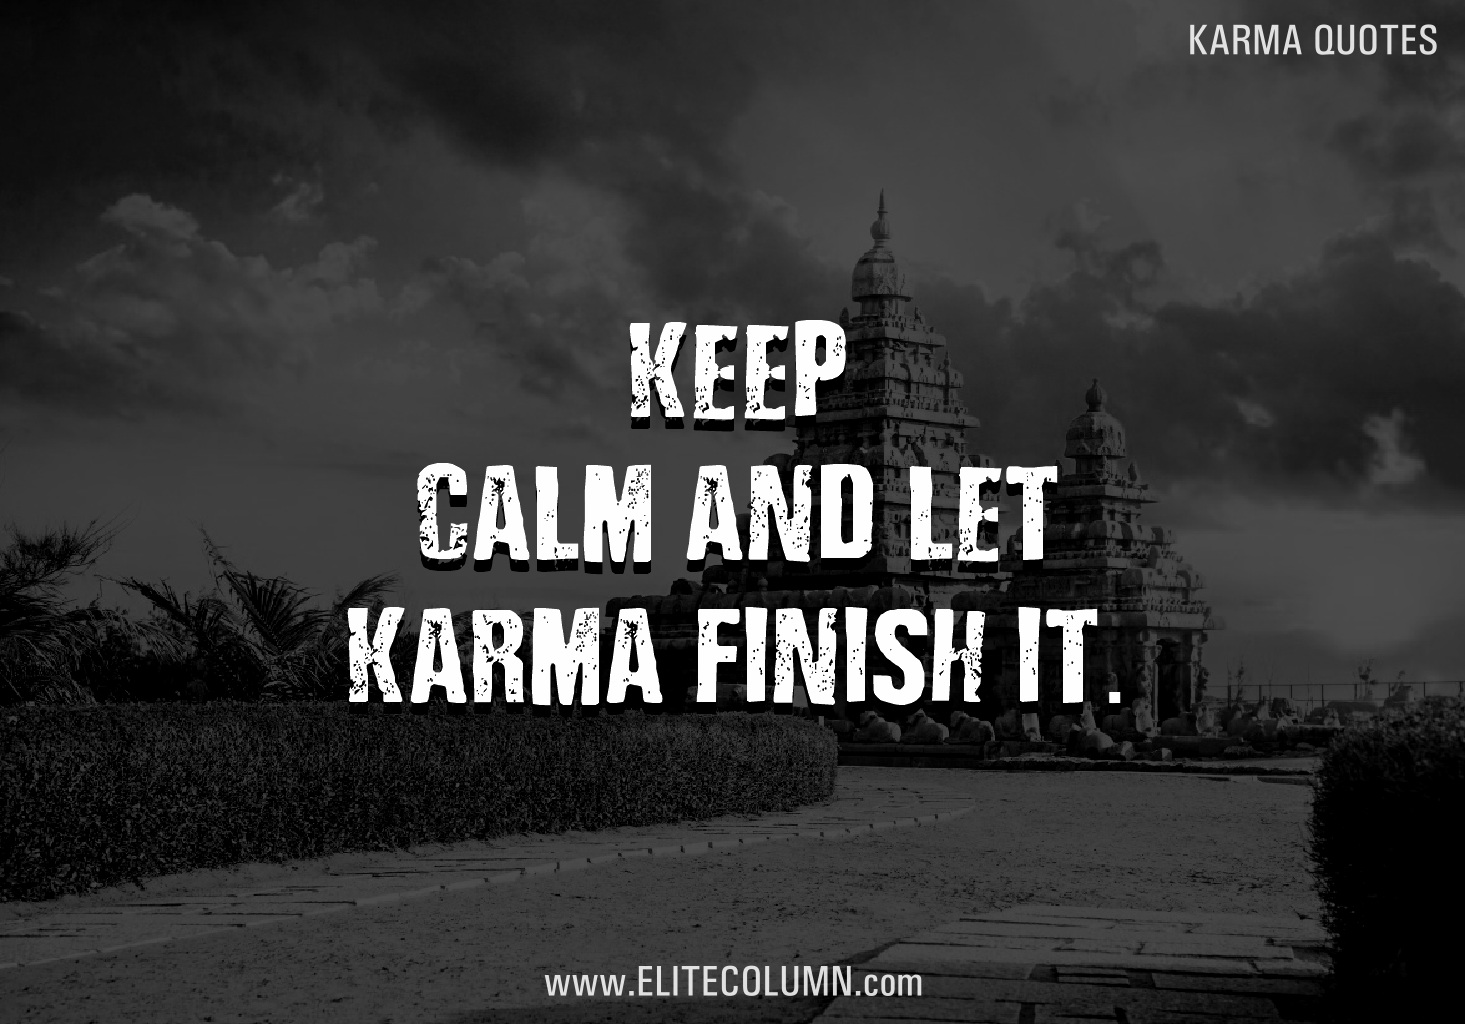 Karma Quotes (11)